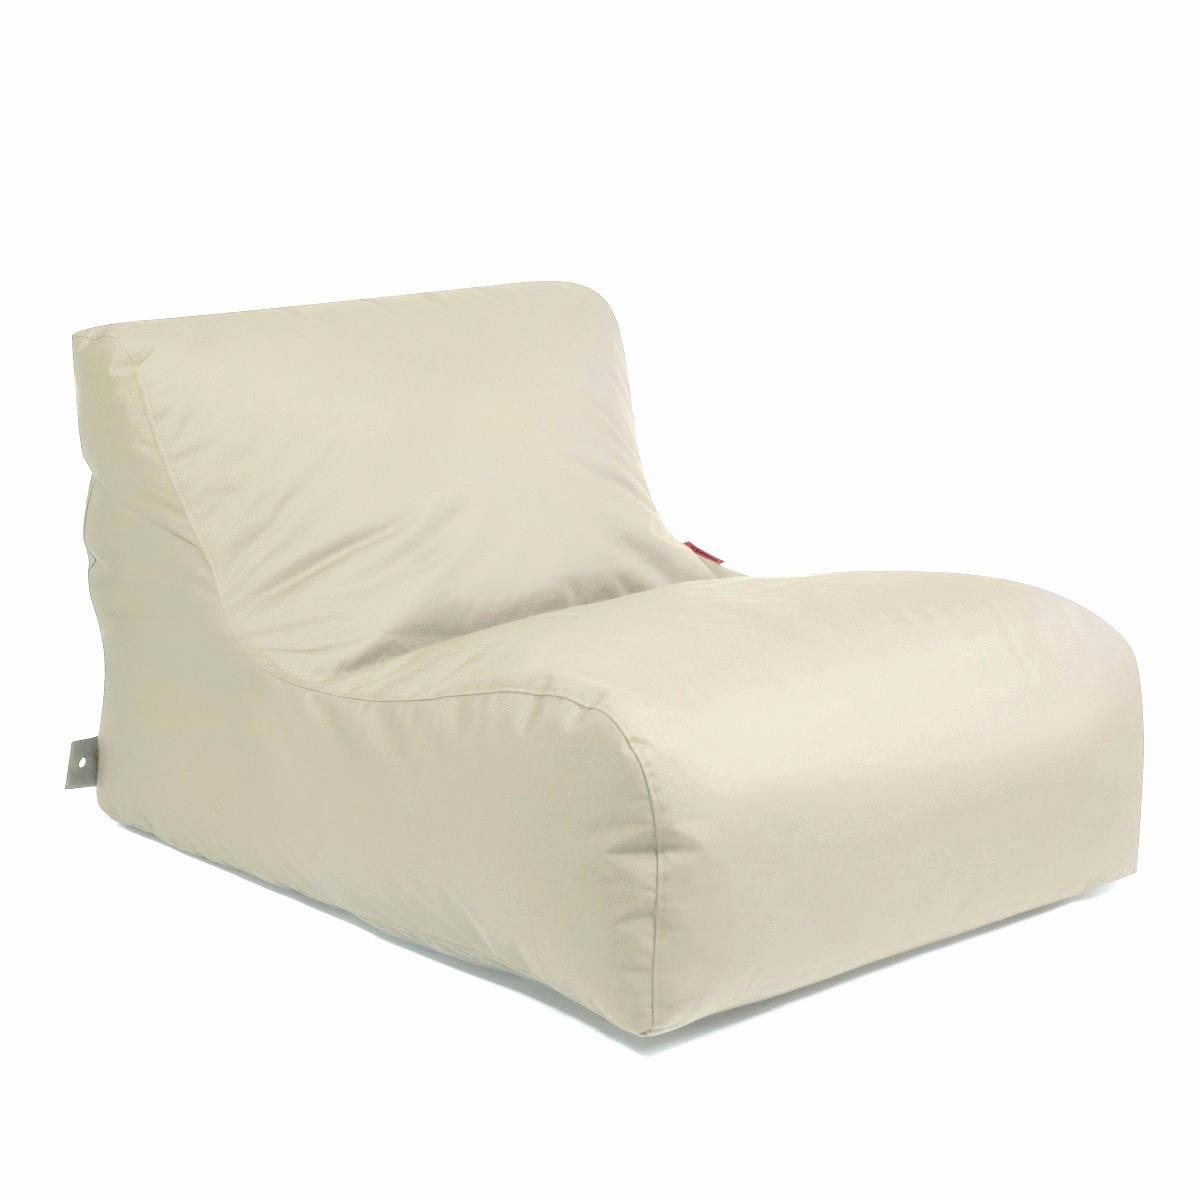 chaise hesperide pas cher inspirant 35 beau chaise hay idees of chaise hesperide pas cher